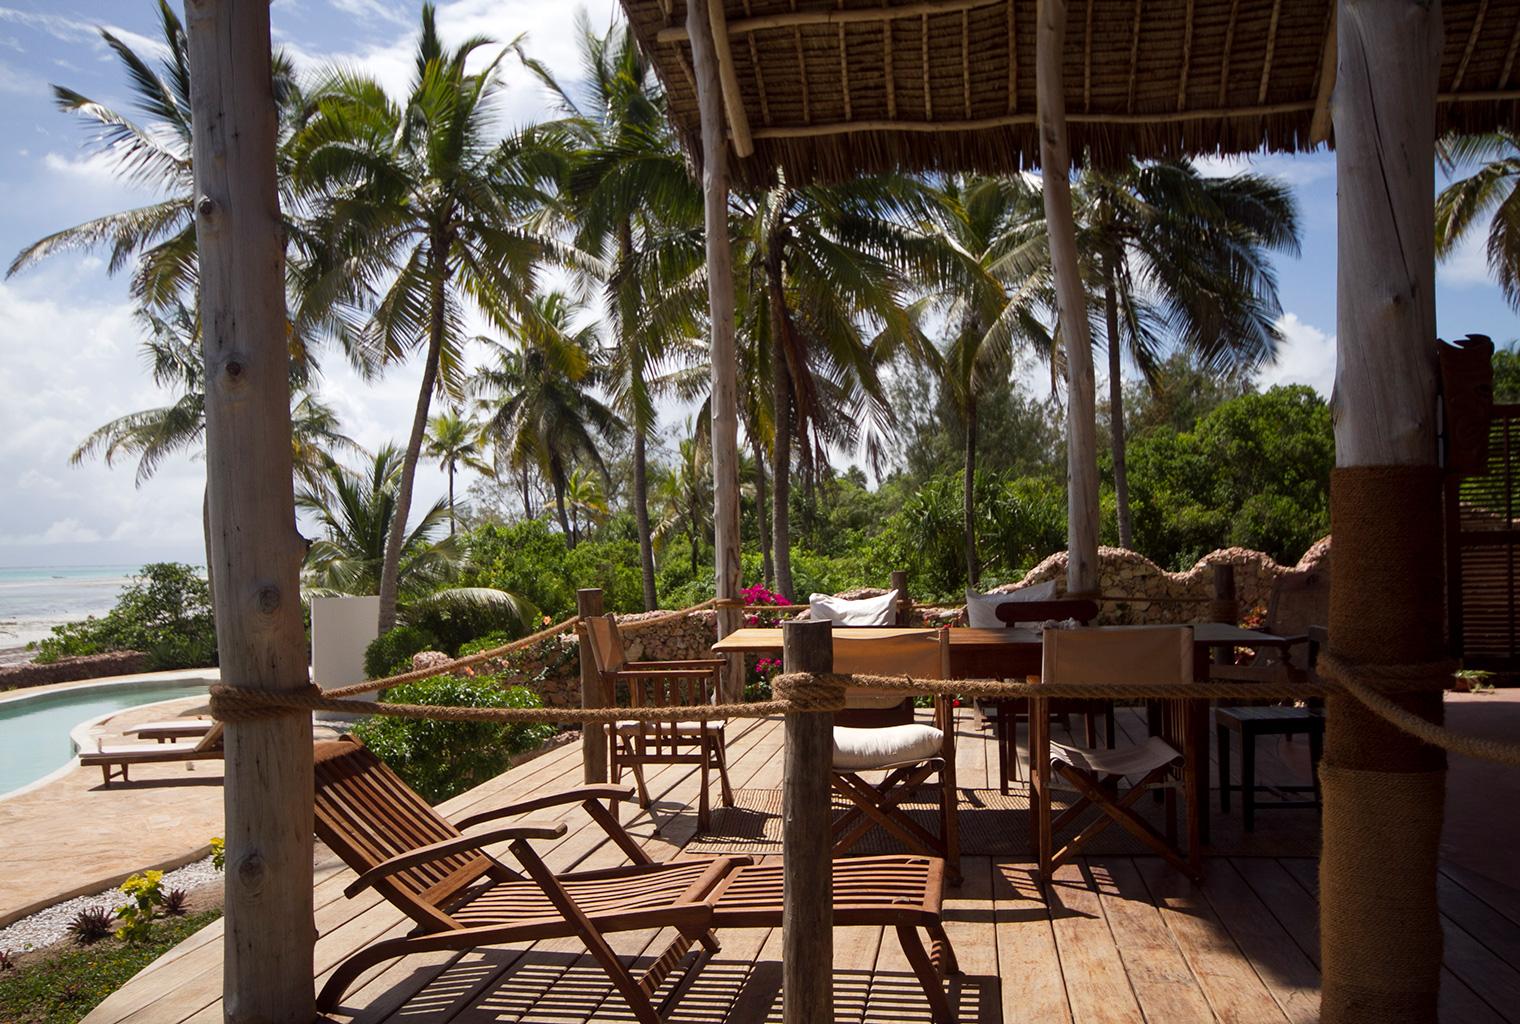 Dar-House-Tanzania-Deck